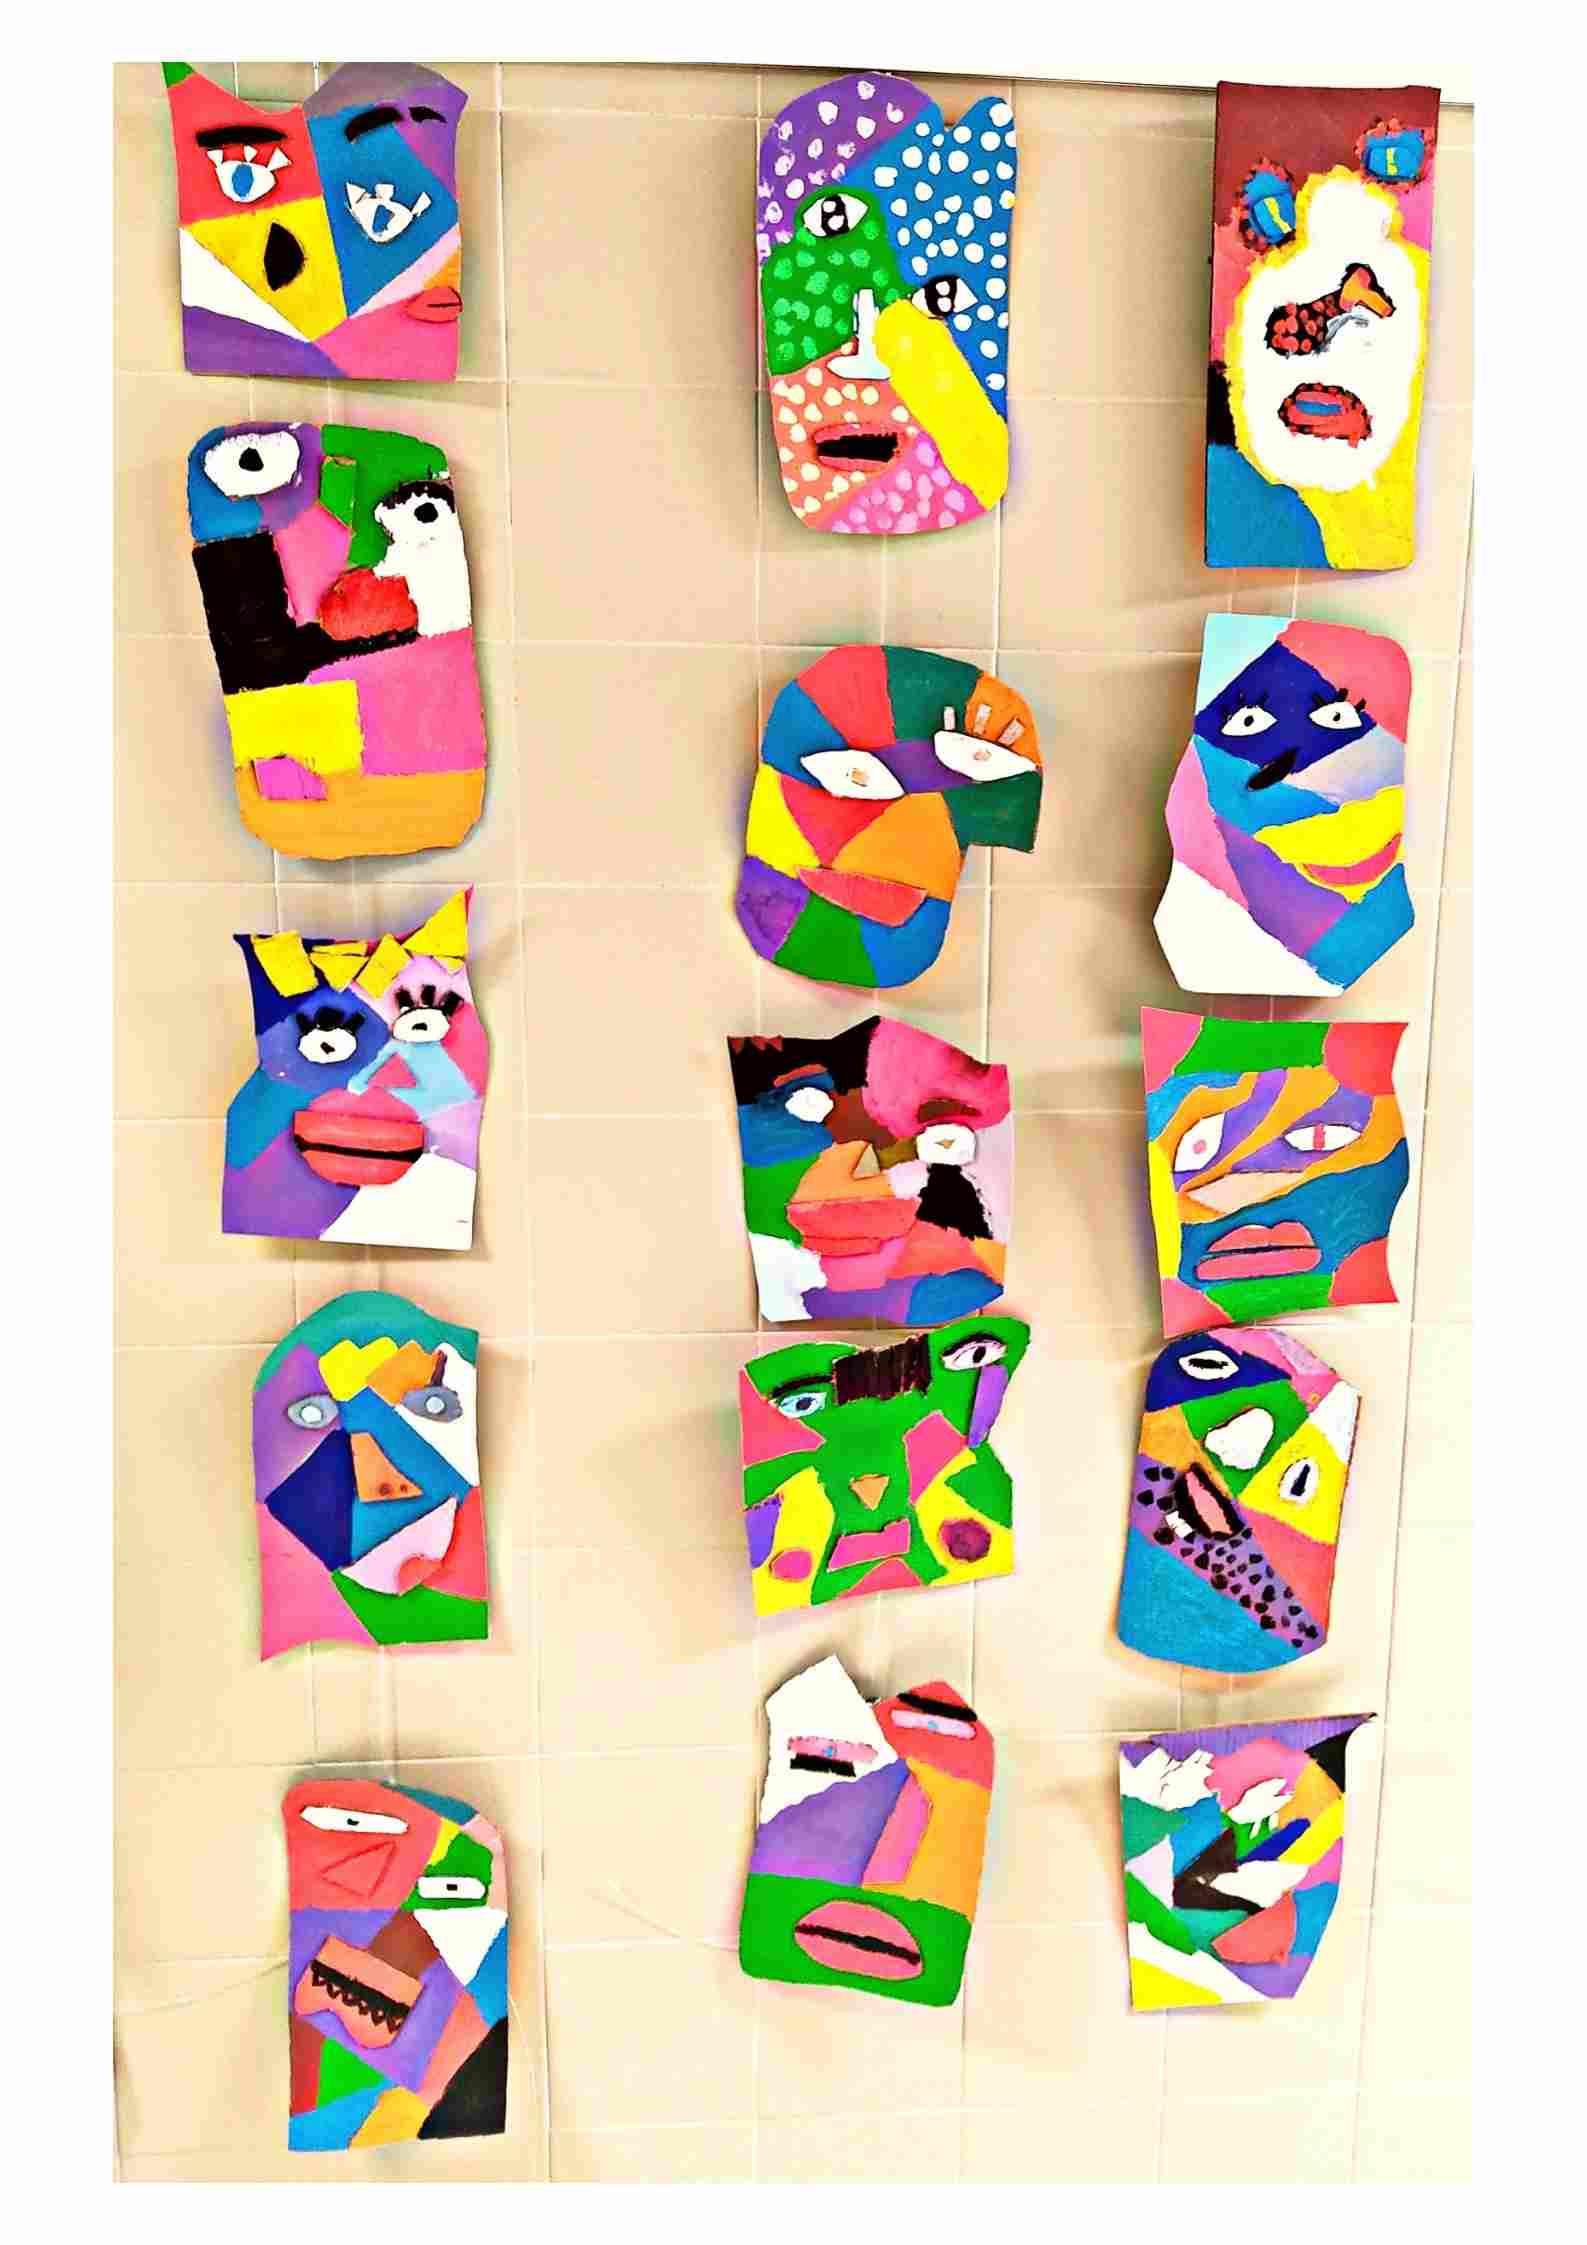 PROJECTE D'ART INSPIRAT EN KIMMY CANTRELL